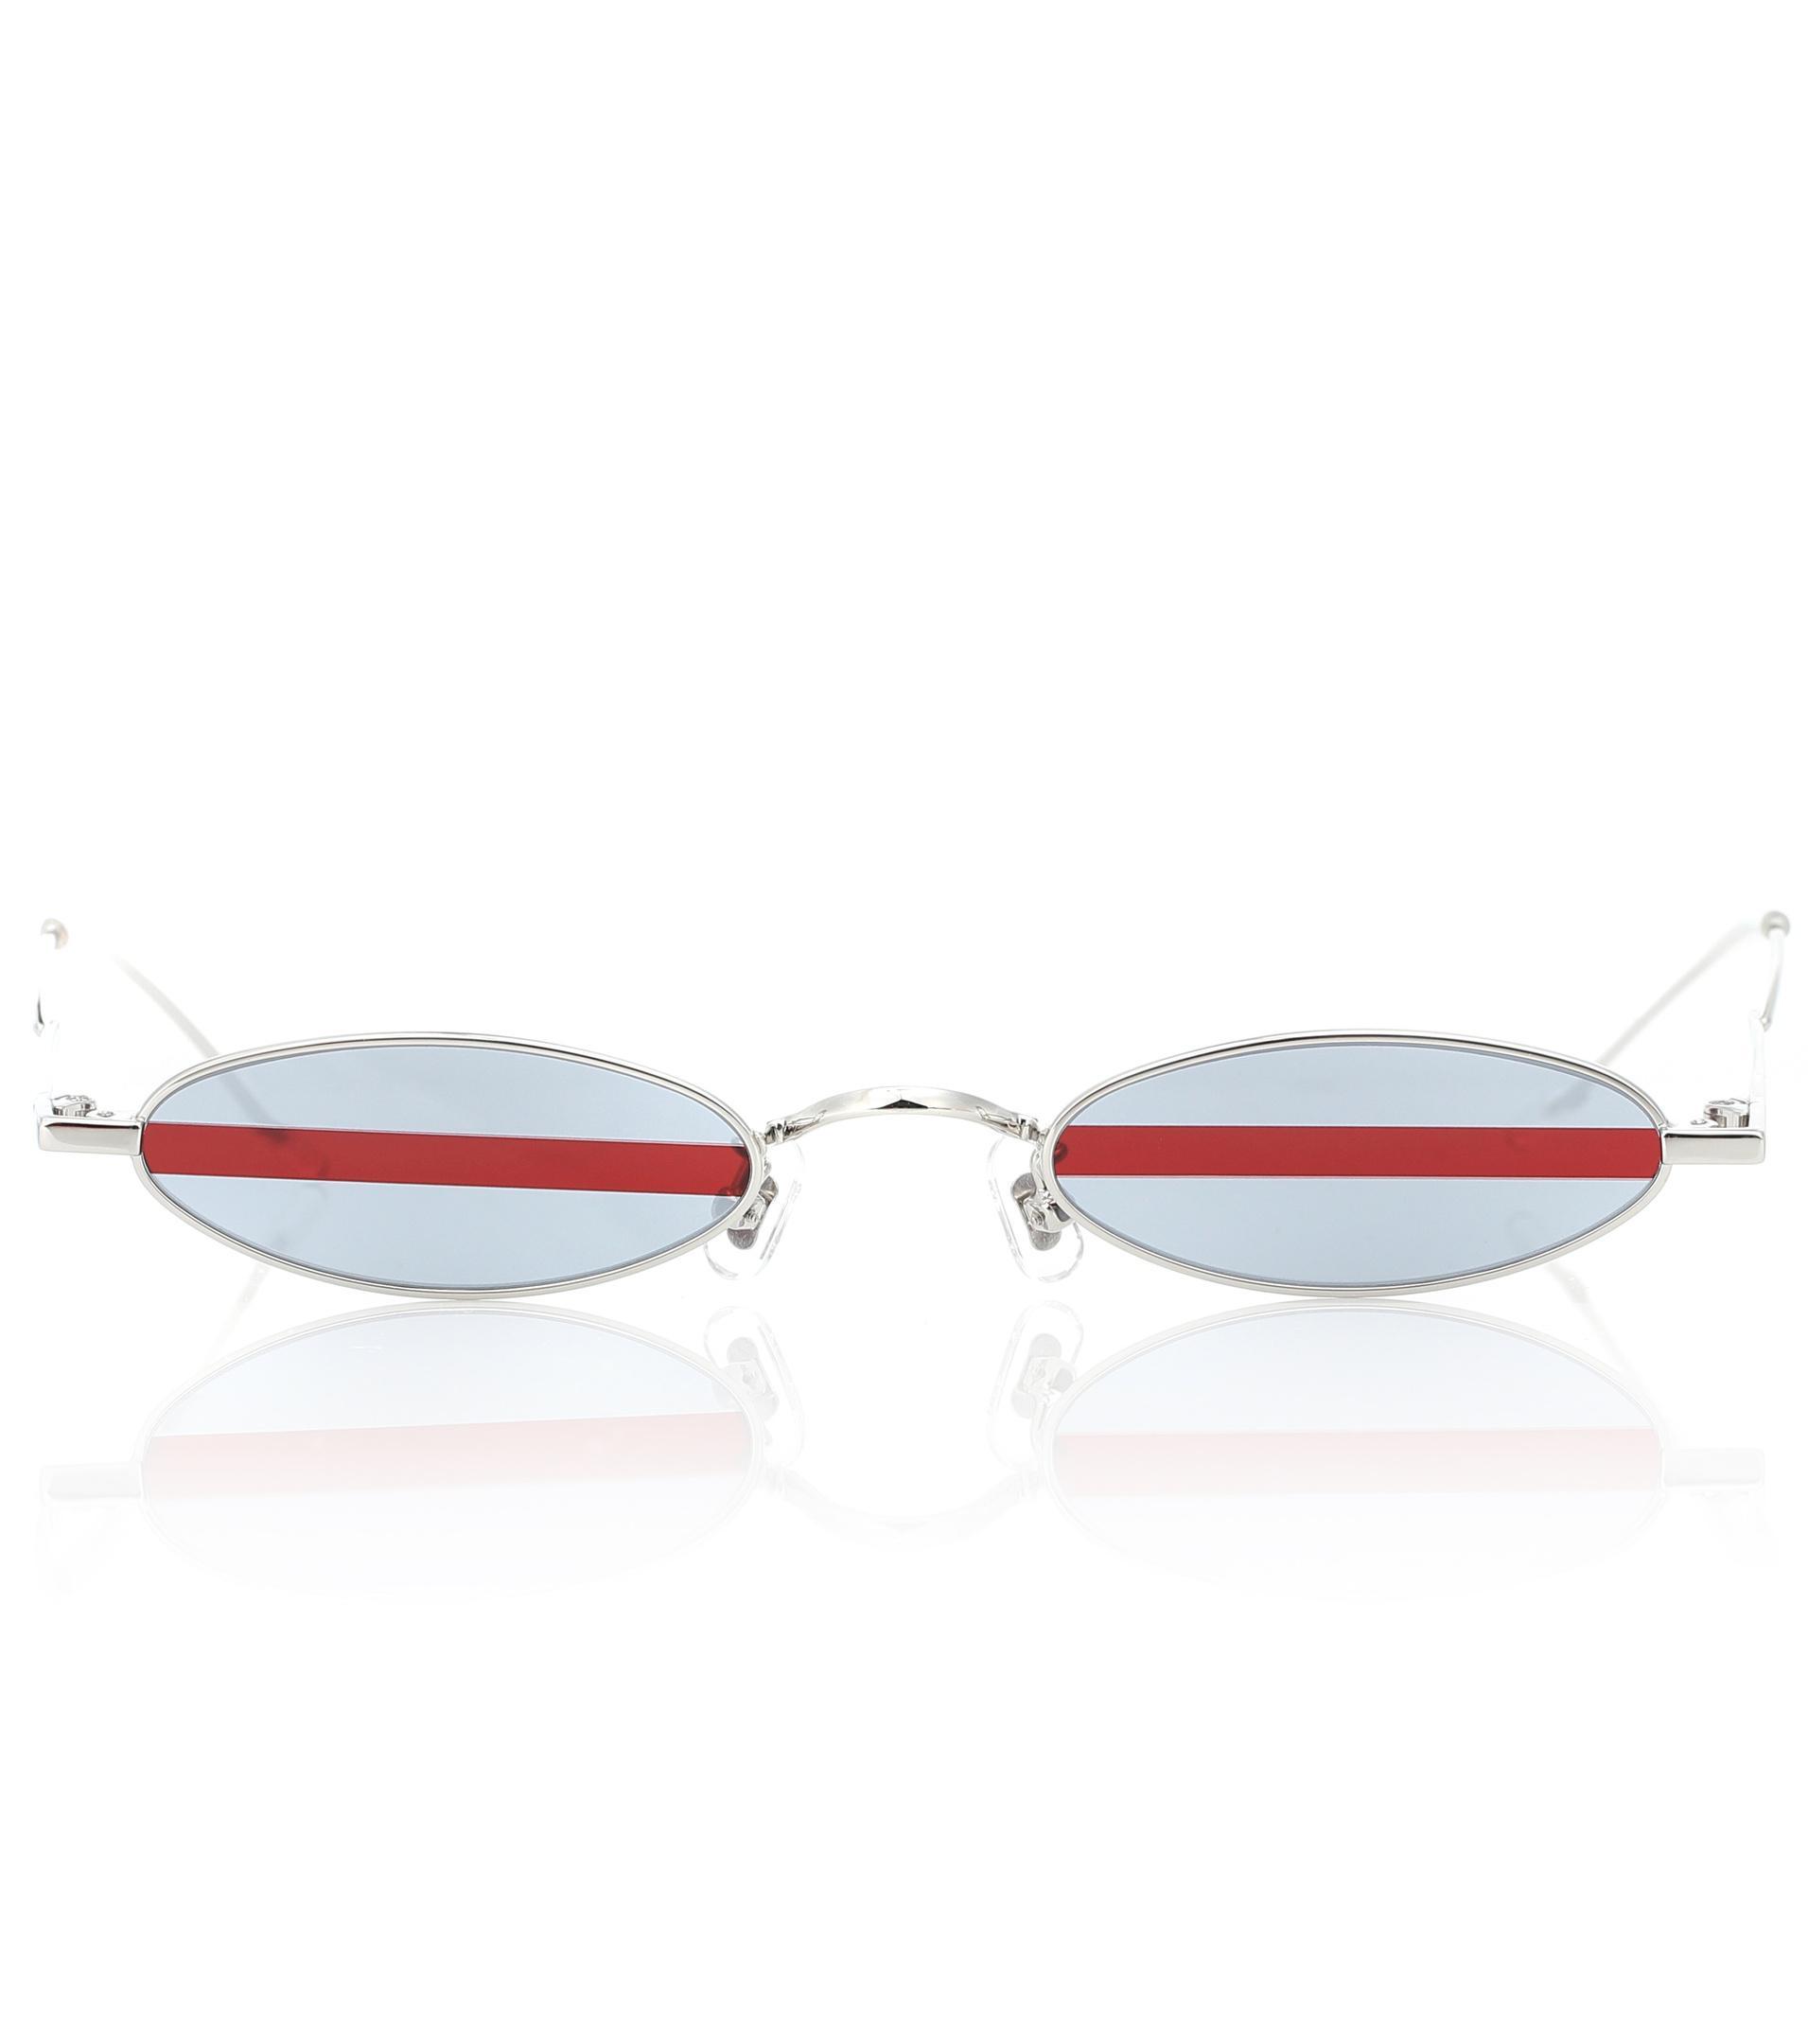 0f646b9623a Gentle Monster Vector 02(r) Sunglasses in Metallic - Lyst